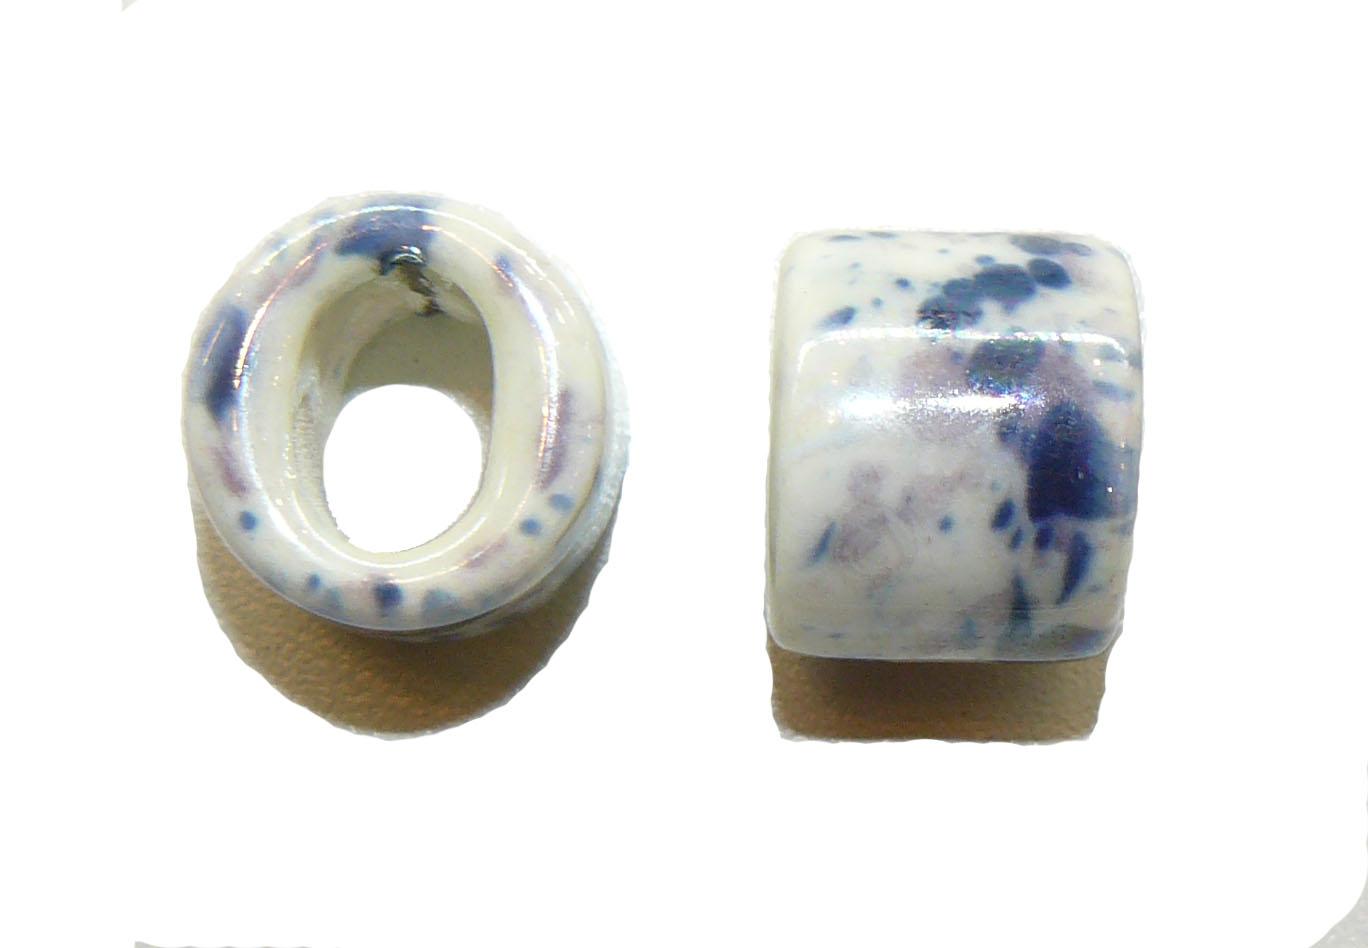 White Ceramic Large Oval Bead